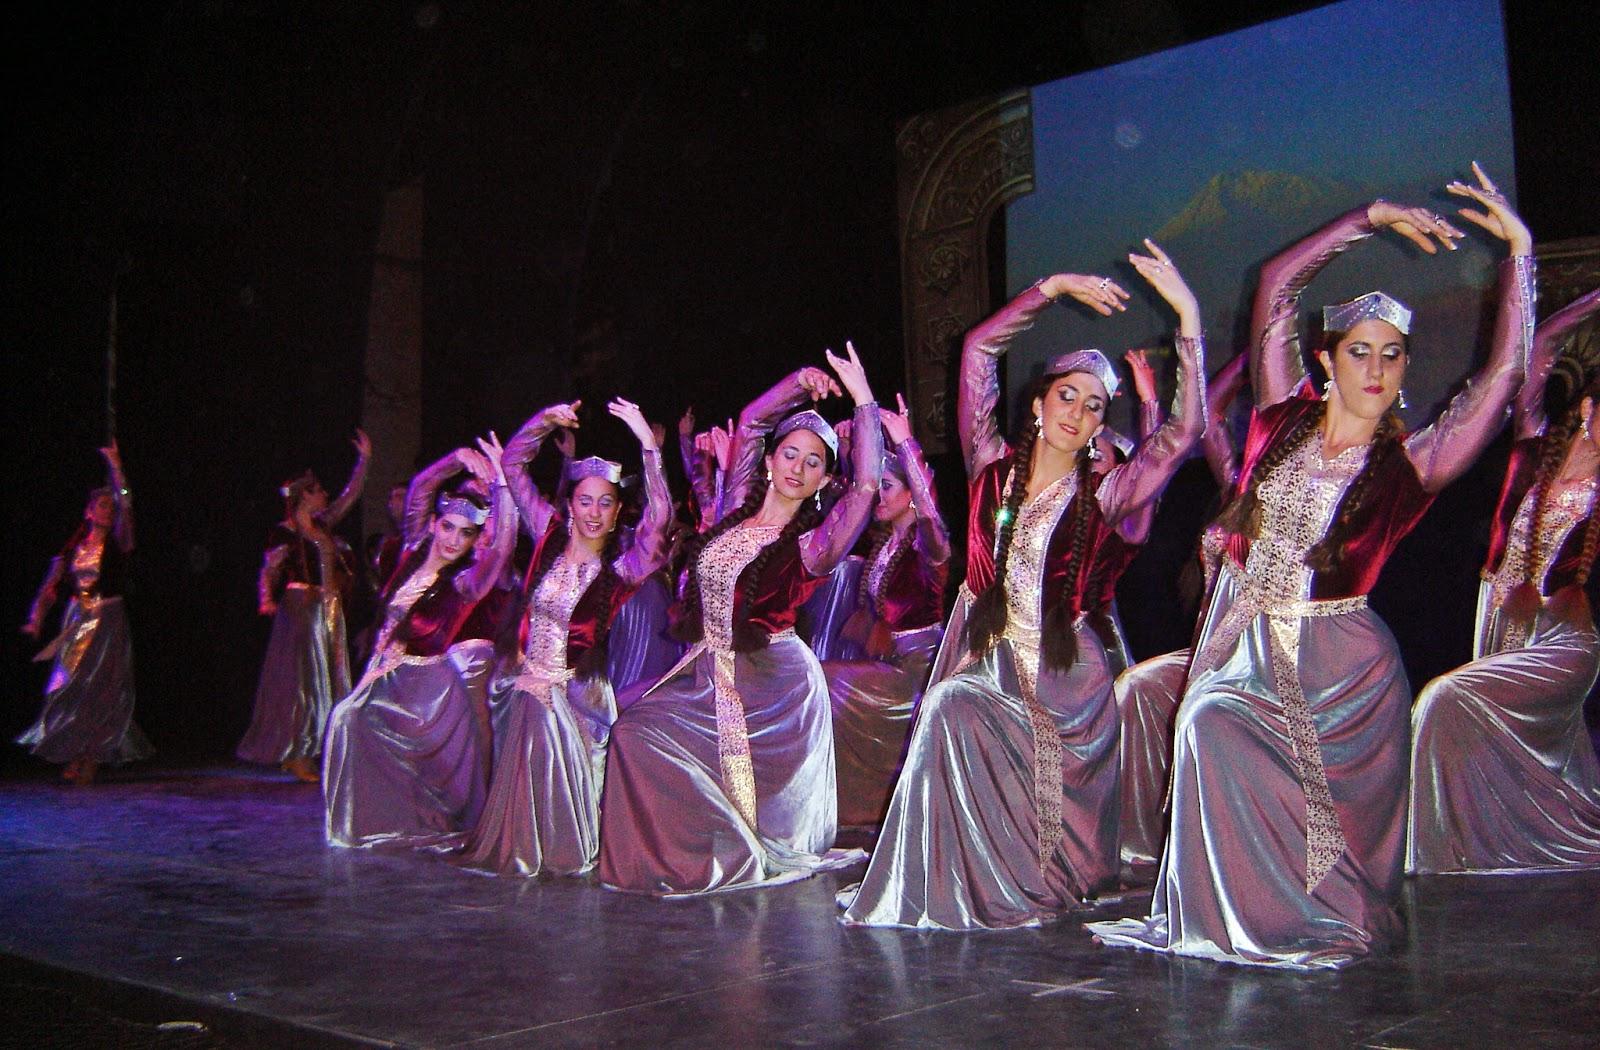 Prensa Armenia: Festival de danza armenia en la calle Corrientes ...